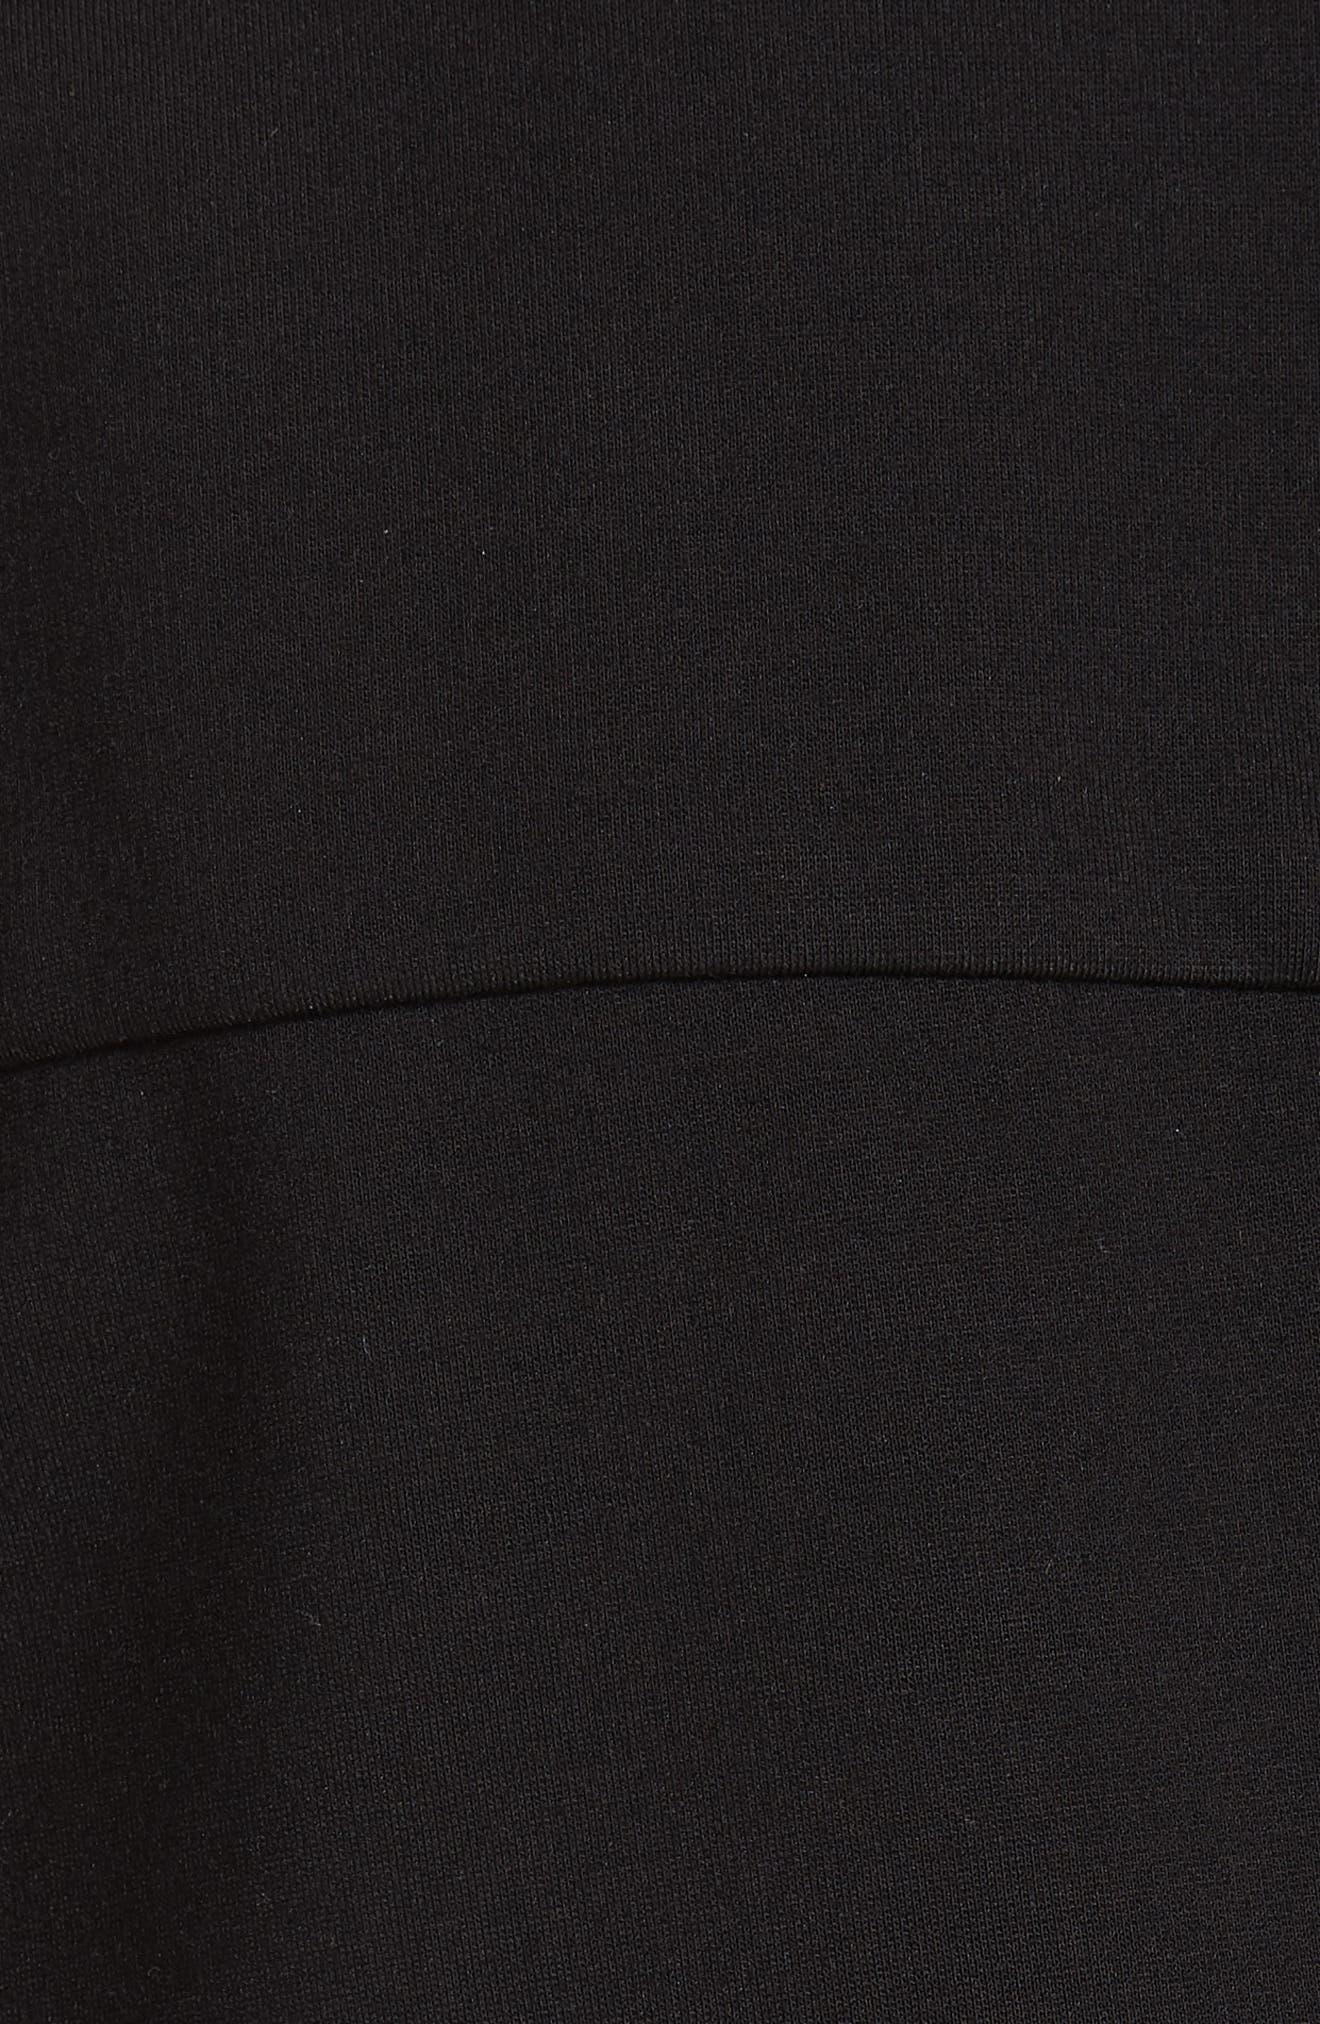 TIBI,                             Asymmetrical Shirtdress,                             Alternate thumbnail 5, color,                             001